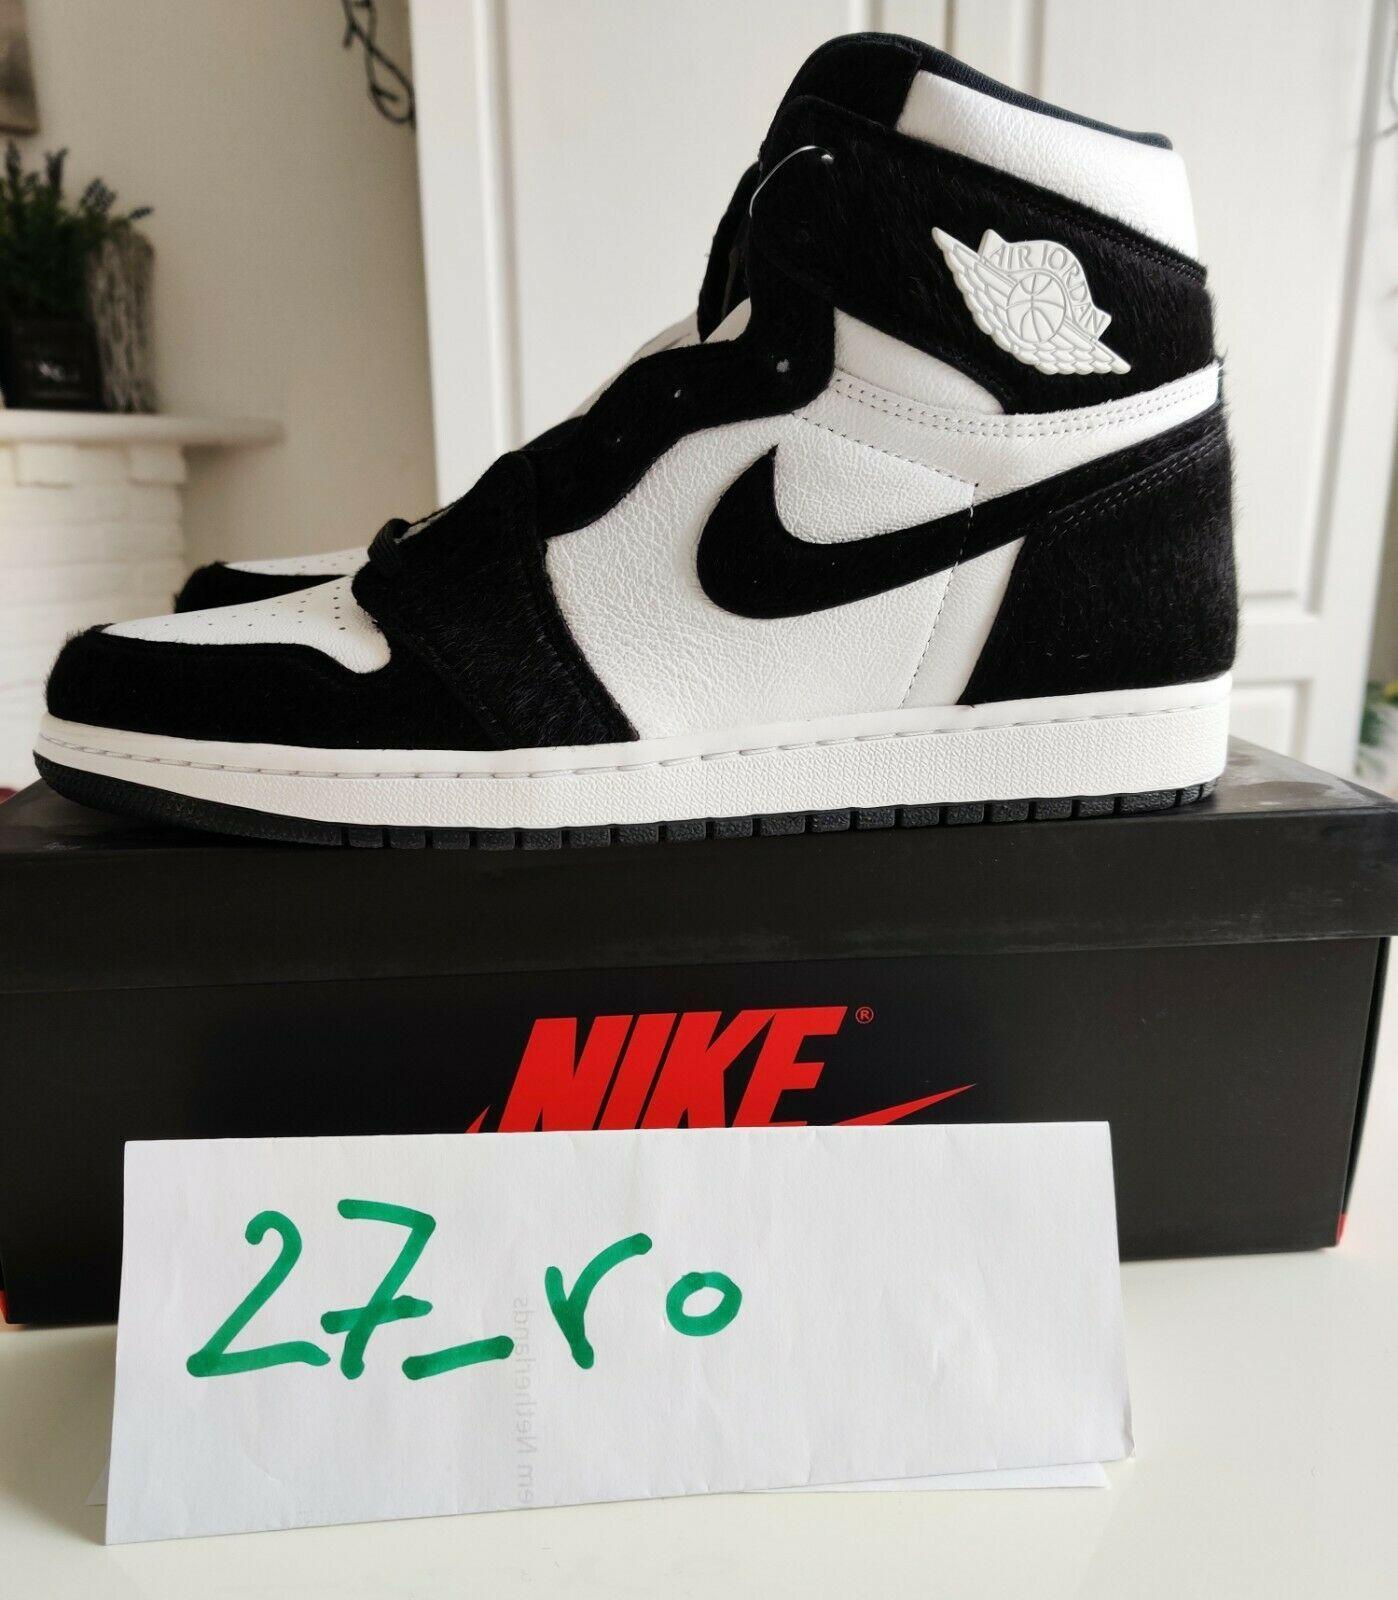 Nike Air Jordan 1 Retro High OG Twist Panda Black White